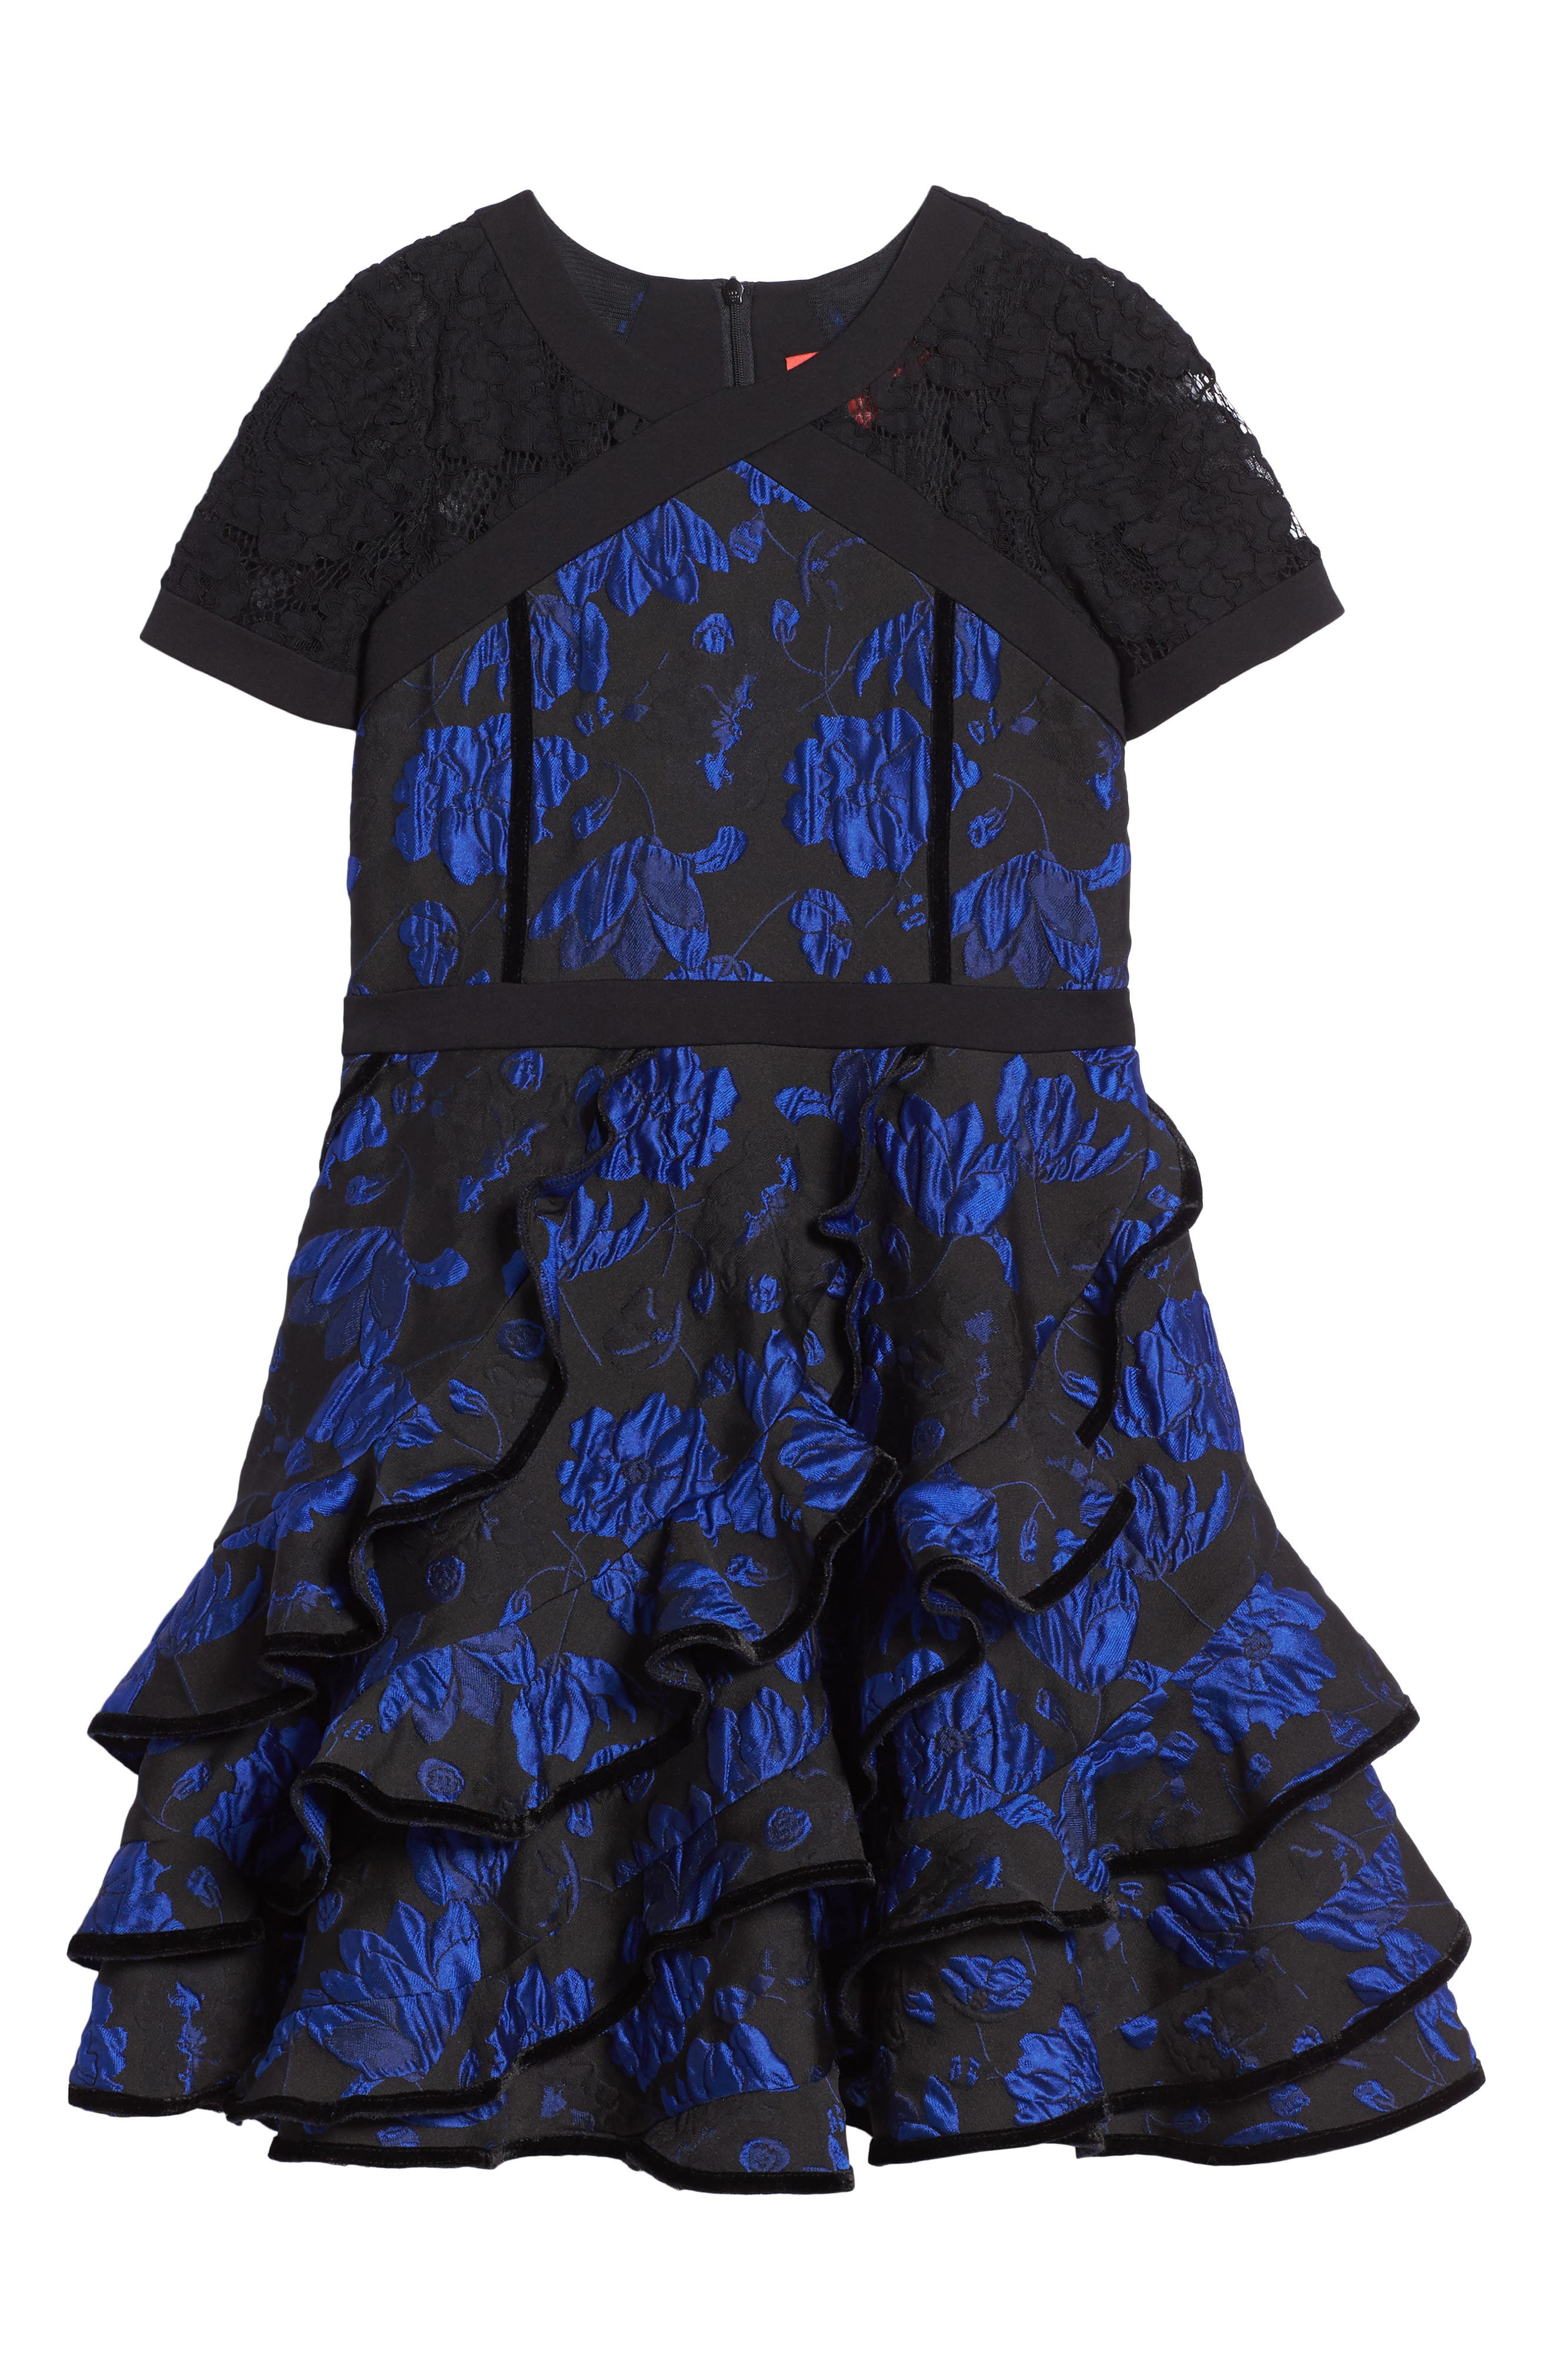 Alternate Image 1 Selected - Tadashi Shoji Brocade Ruffle Dress (Toddler Girls, Little Girls & Big Girls)